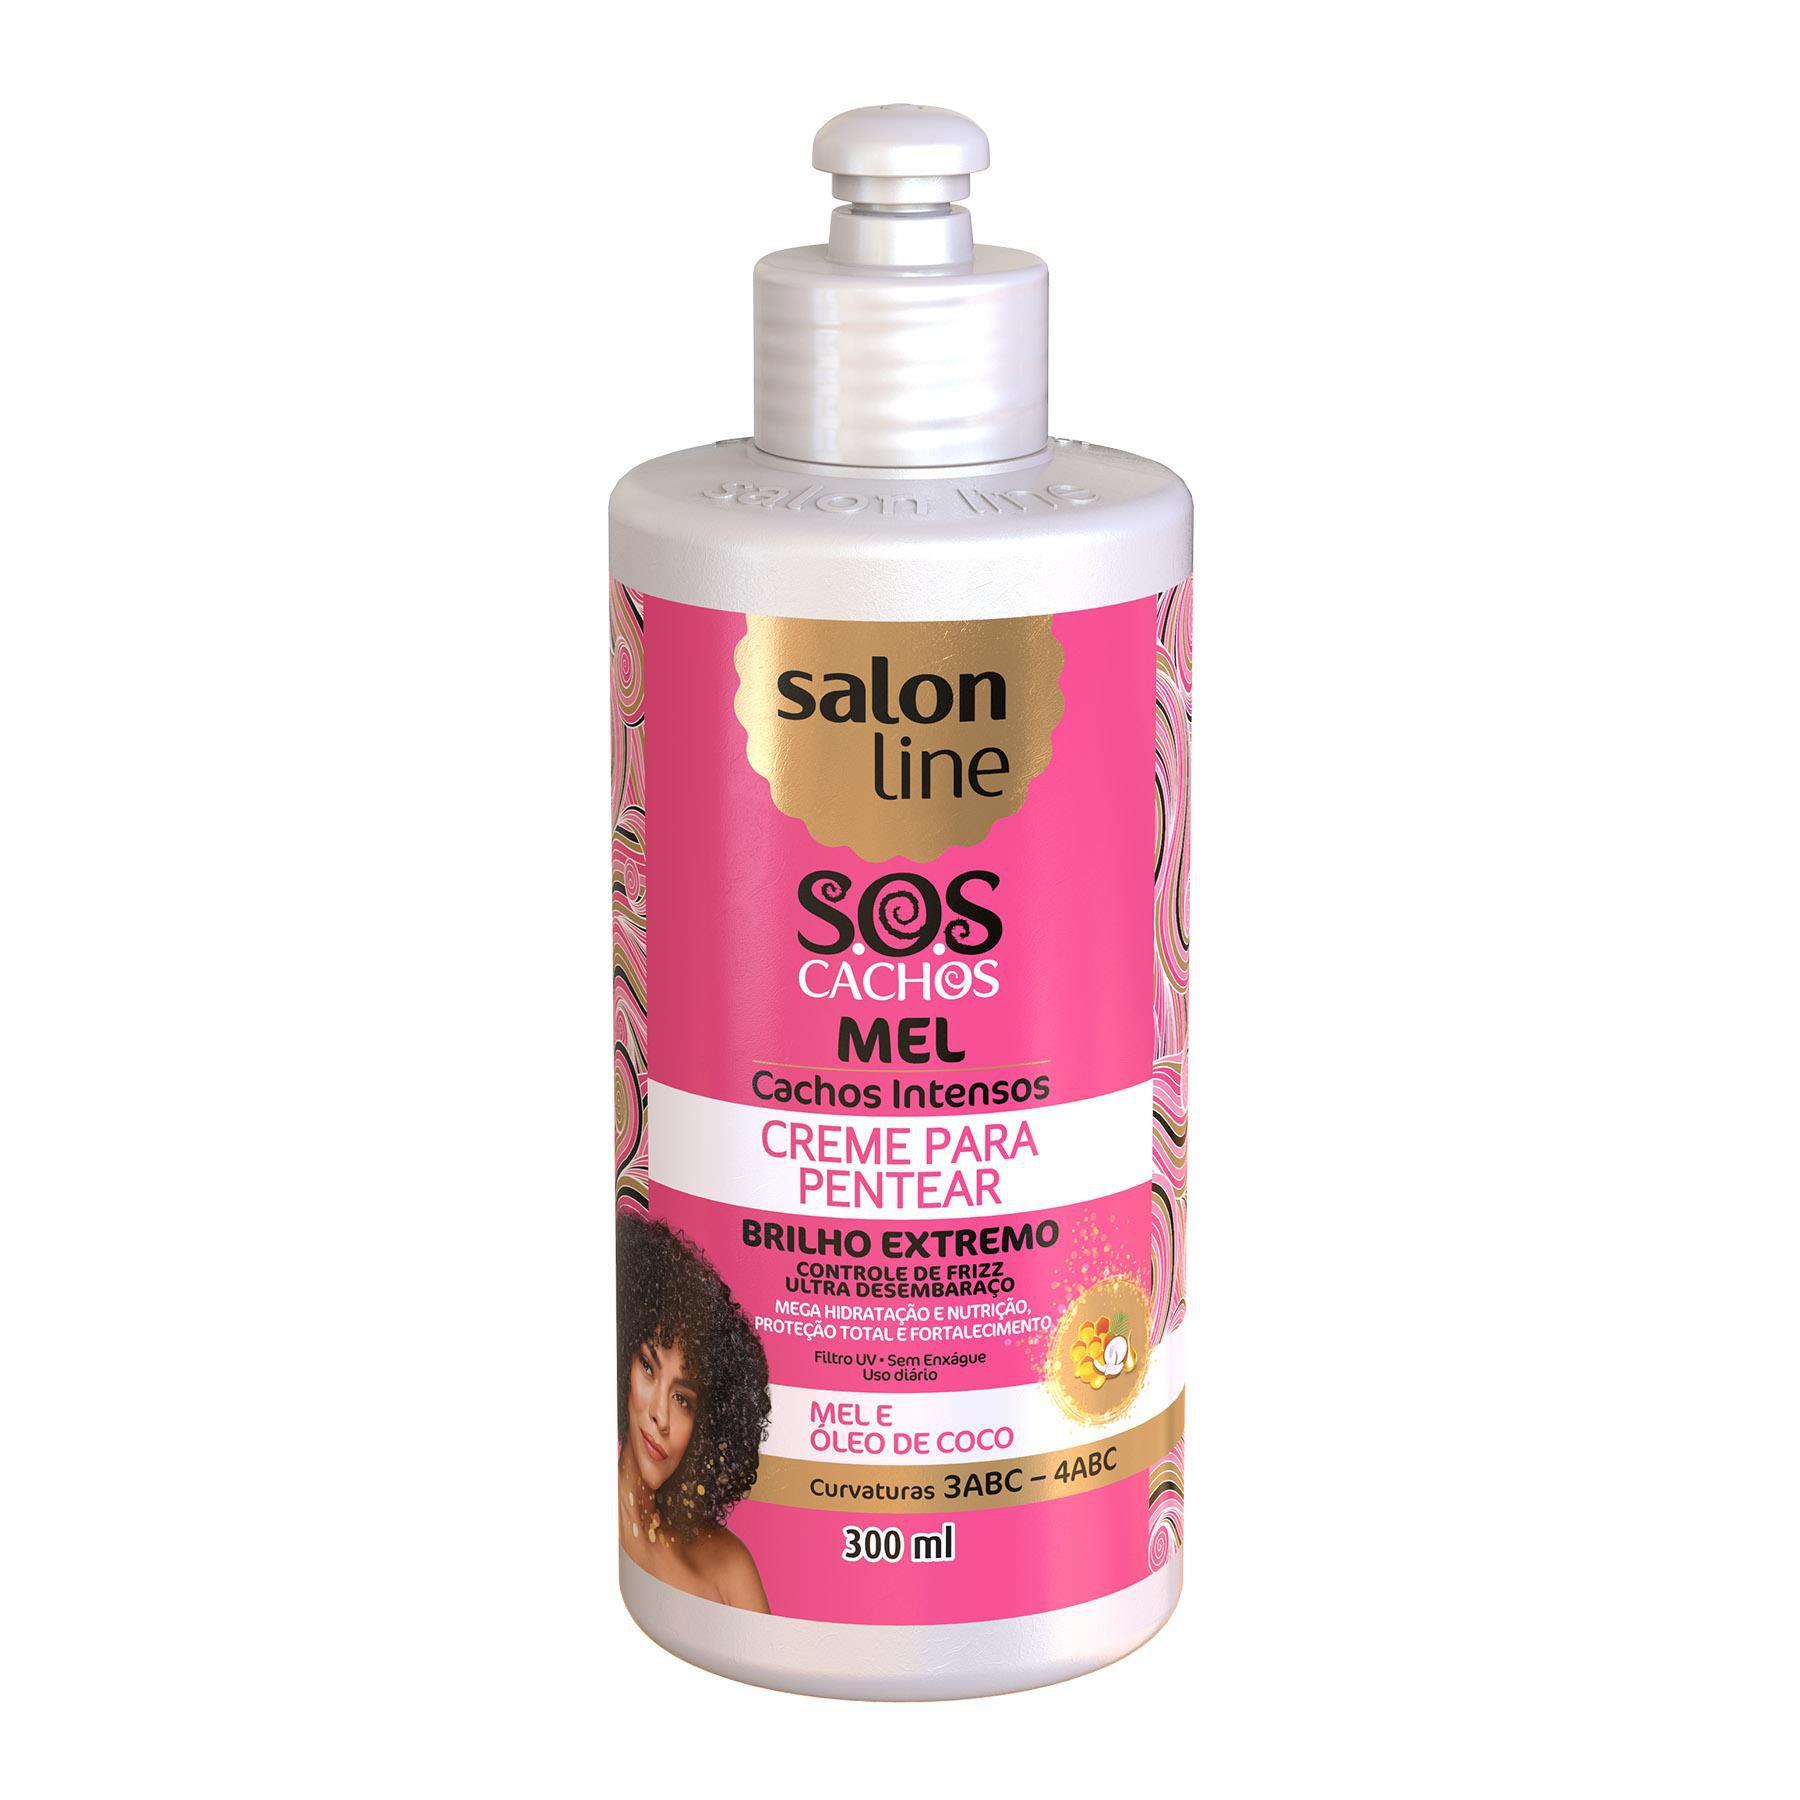 Salon Line Creme para Pentear S.O.S Cachos Mel Cachos Intensos Creme de Pentear 300ml